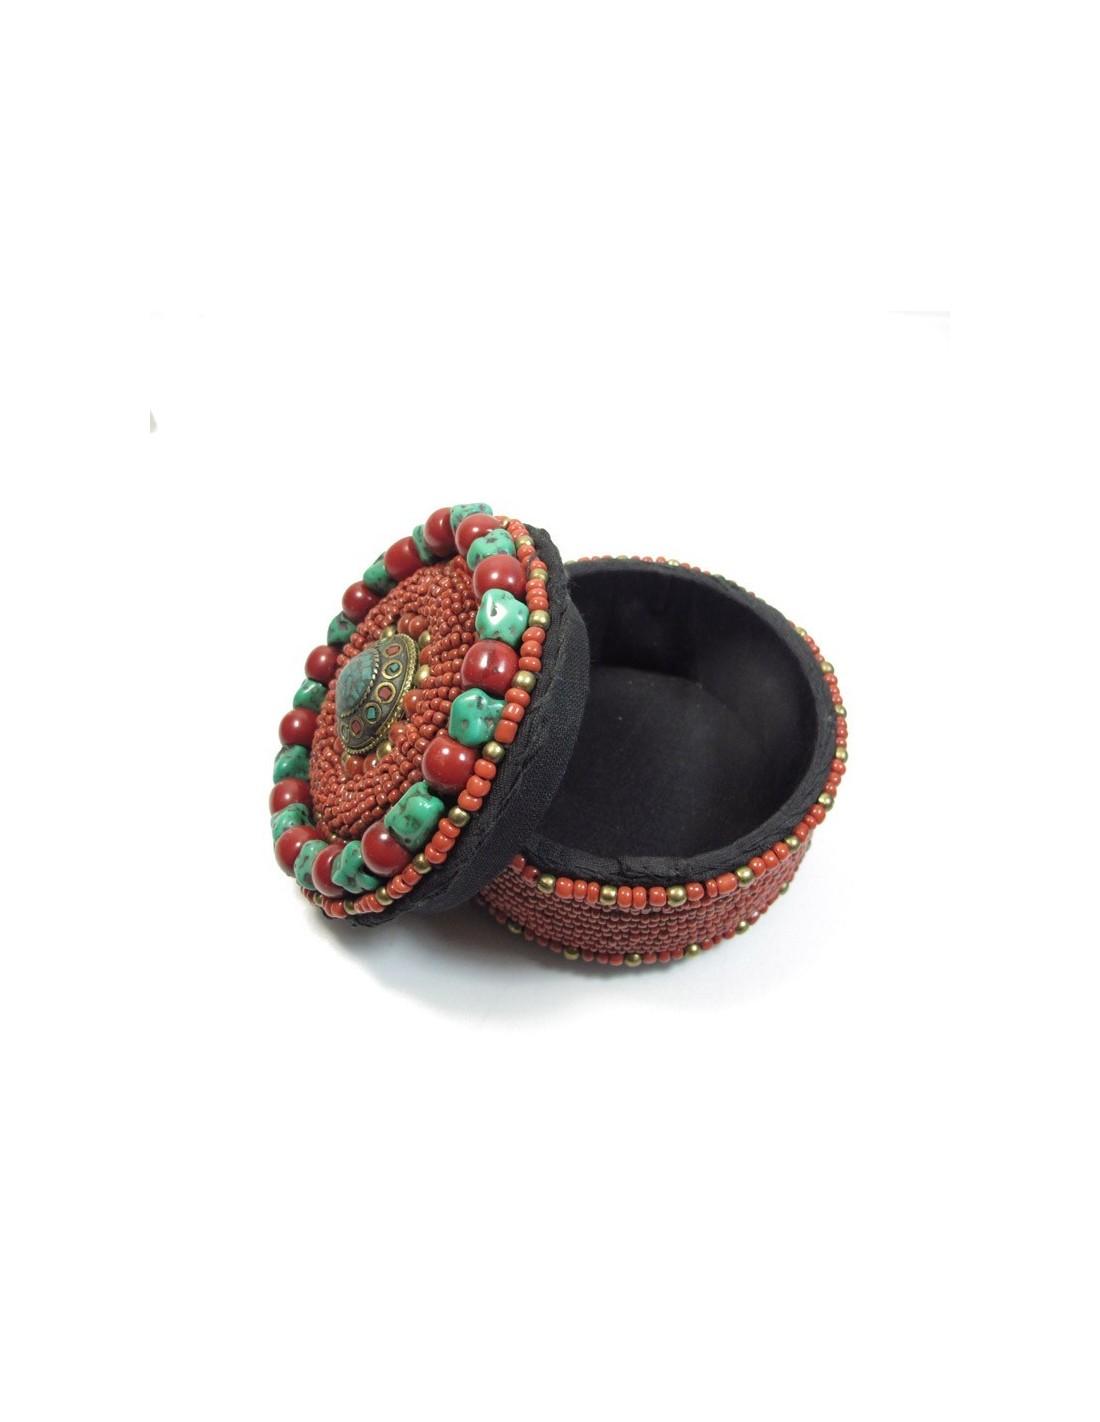 Boite bijoux vente de bijoux indiens a44 - Boite a bijoux originale ...